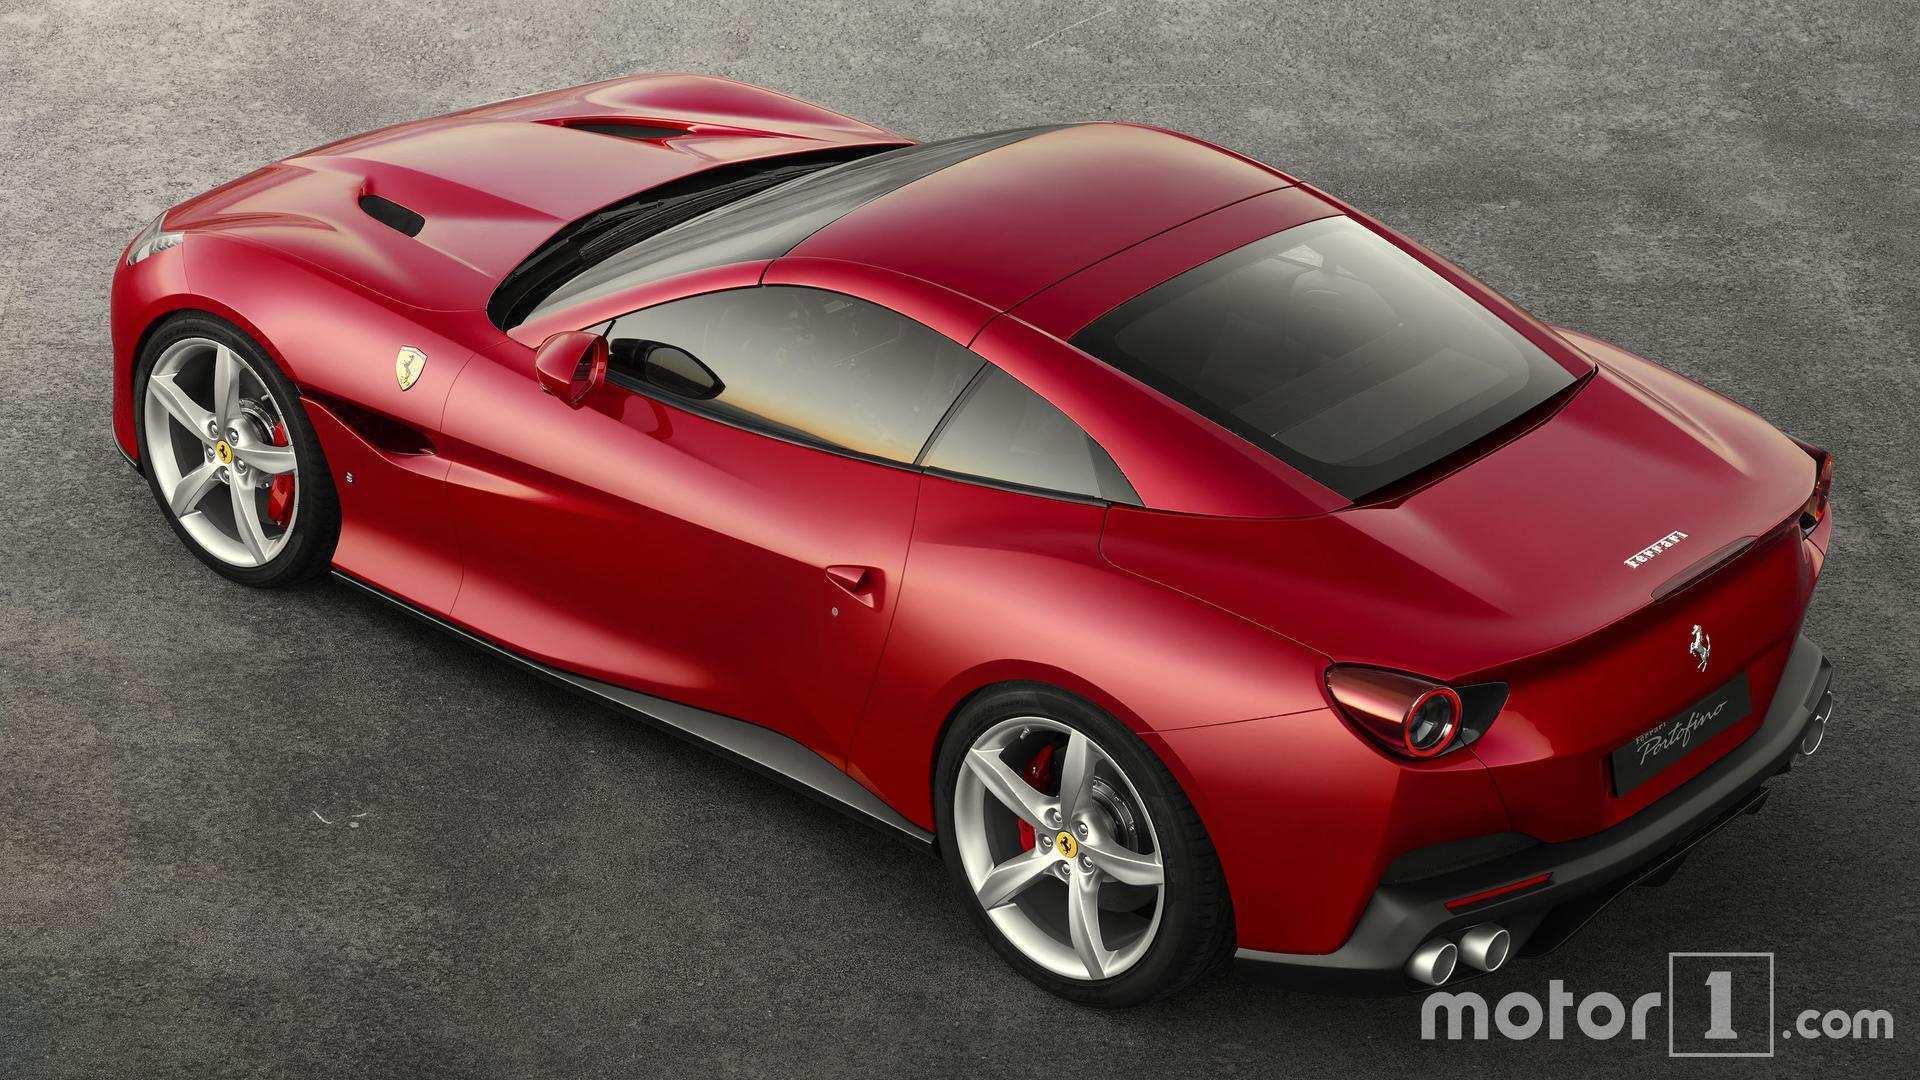 75 Concept of Ferrari B 2020 First Drive with Ferrari B 2020